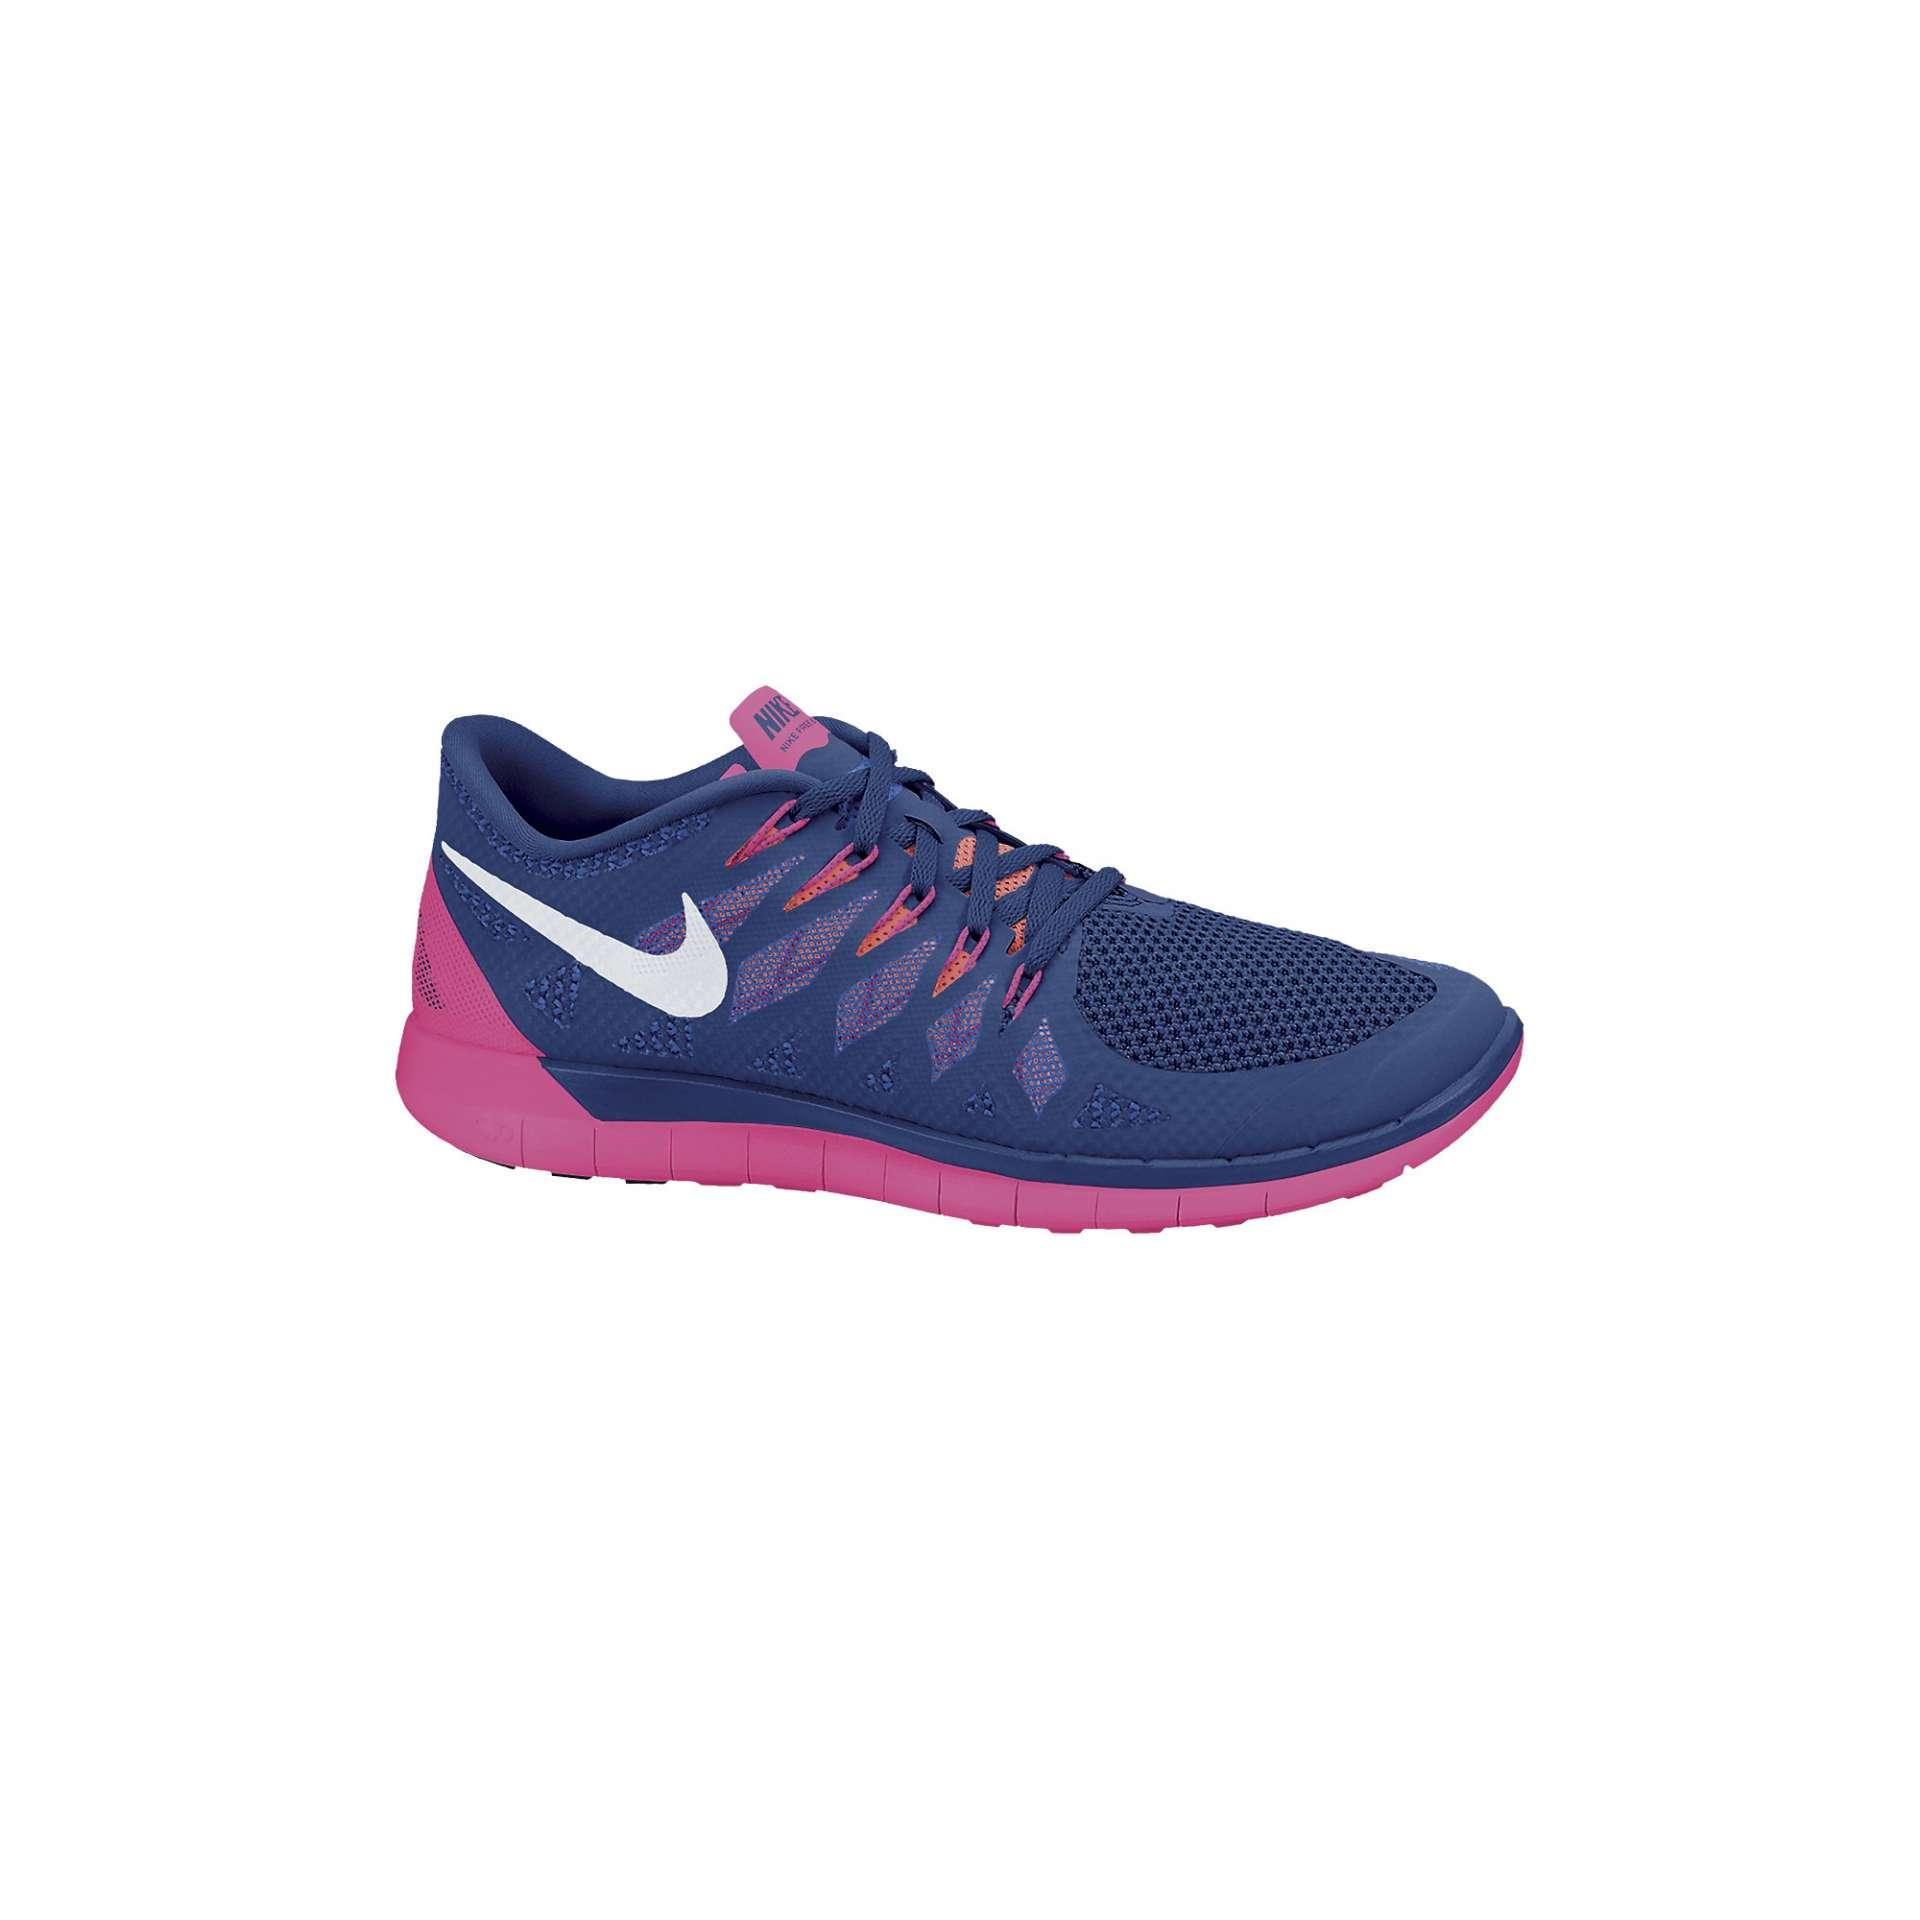 factory authentic c7580 b7c16 Nike Free 5.0 Hardloopschoenen BlauwRoze Dames